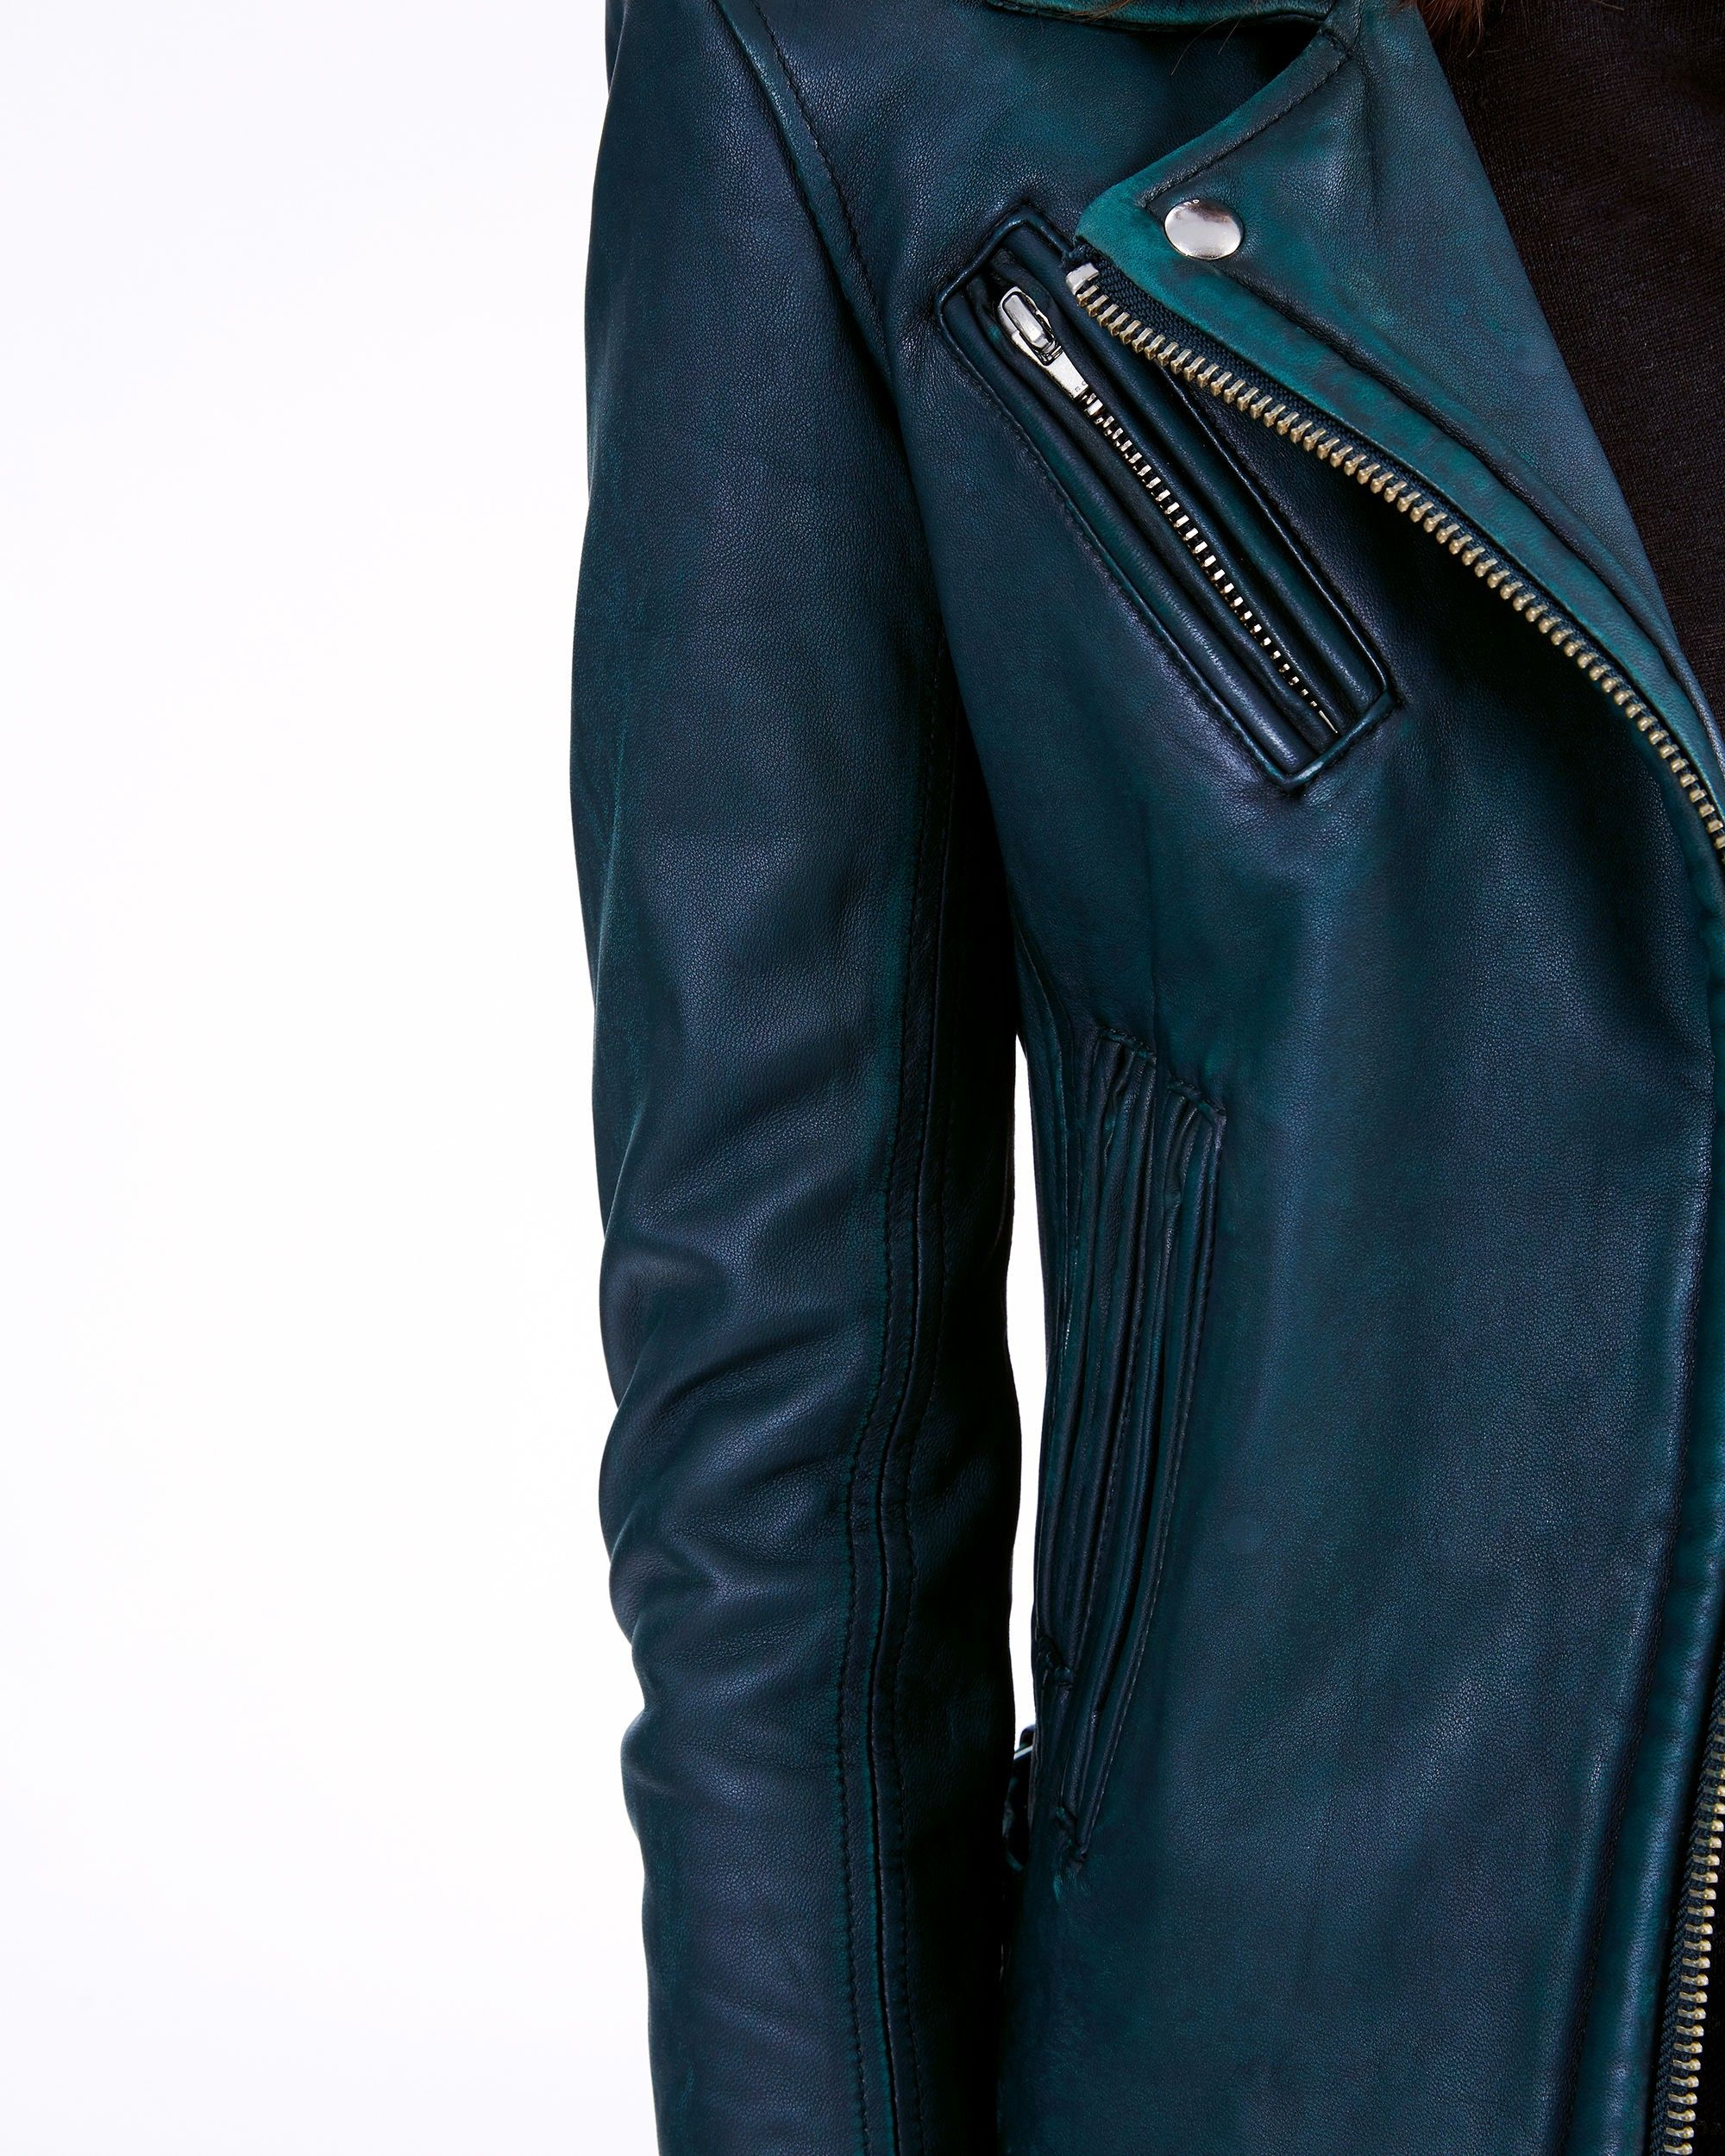 Iro Han Leather Jacket Dark Green 34 Leather Jacket Jackets Fashion [ 2500 x 2000 Pixel ]